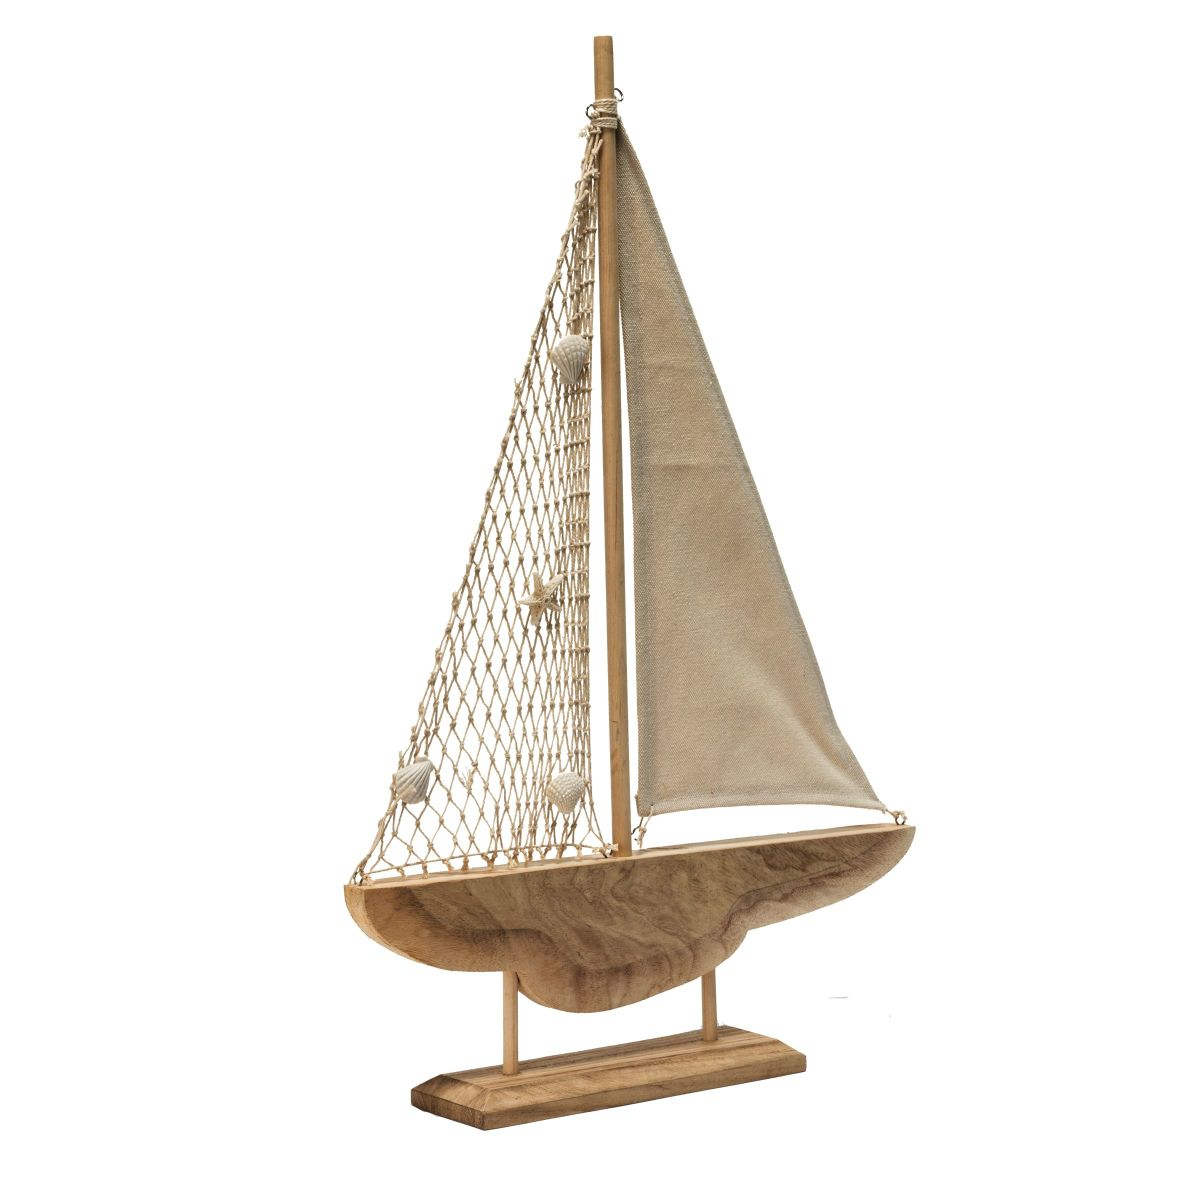 Deko objekt segelboot einfach geschenke for Deko geschenke